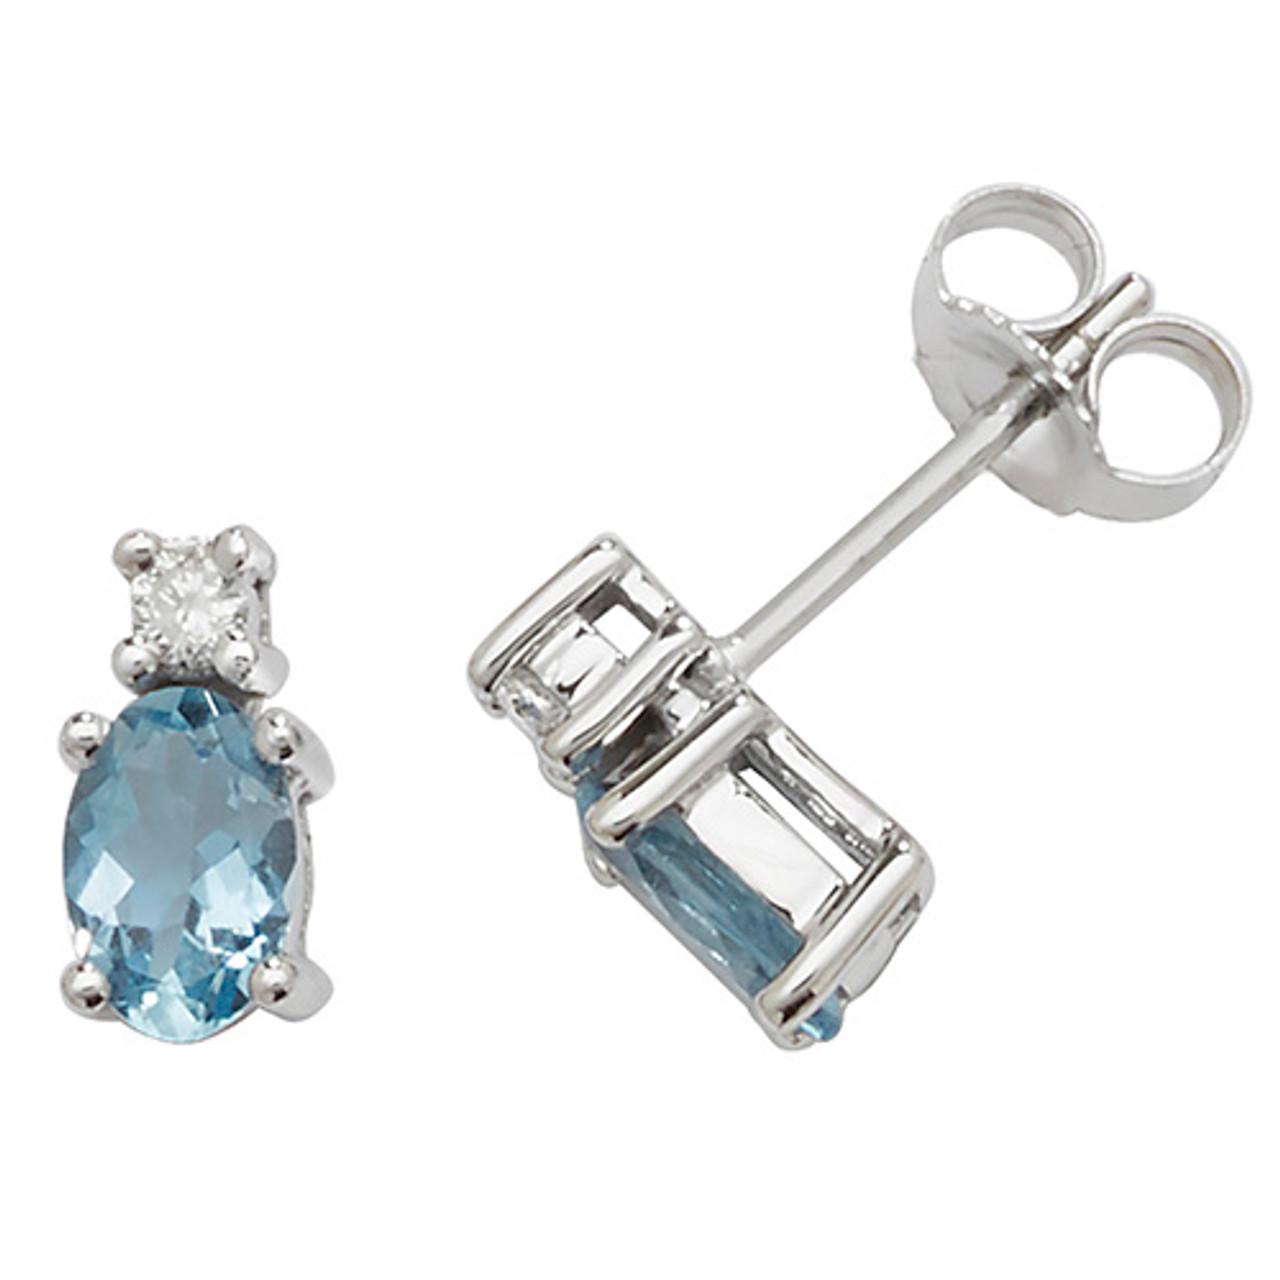 9ct White Gold Aquamarine & Diamond Oval Earrings